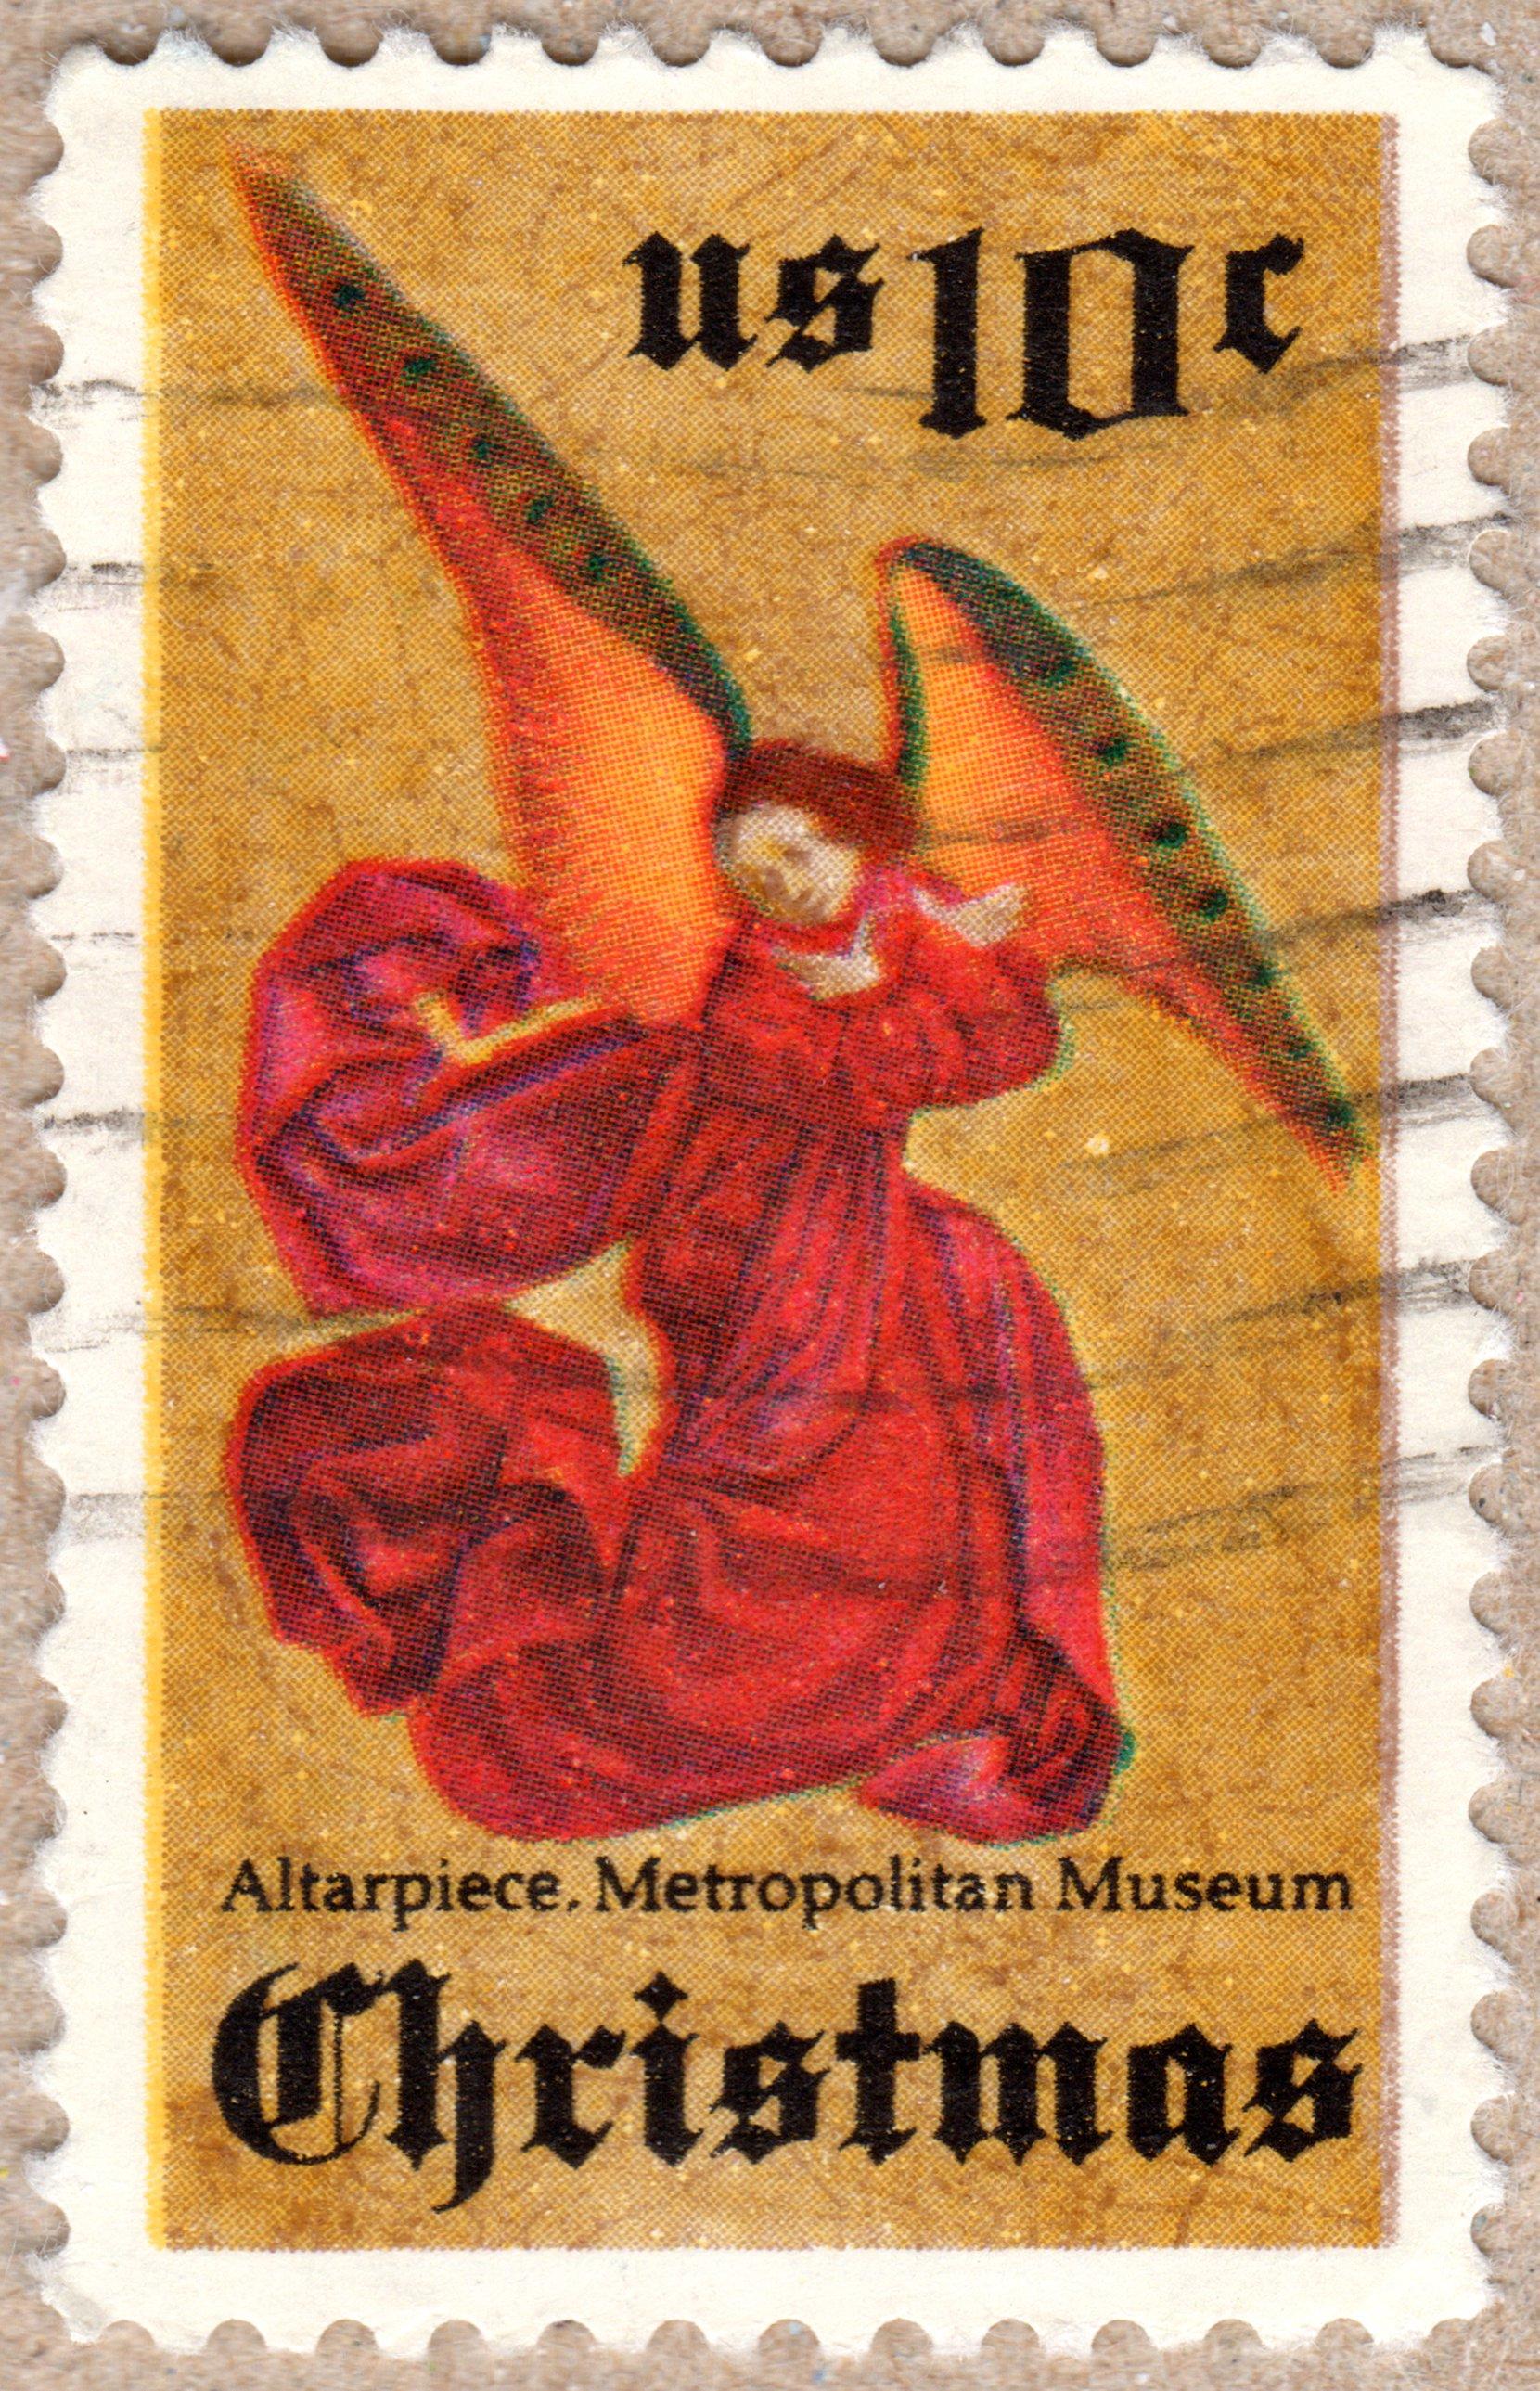 christmas, altarpiece. metropolitan museum, u.s. 10¢ stamp philately postage stamps